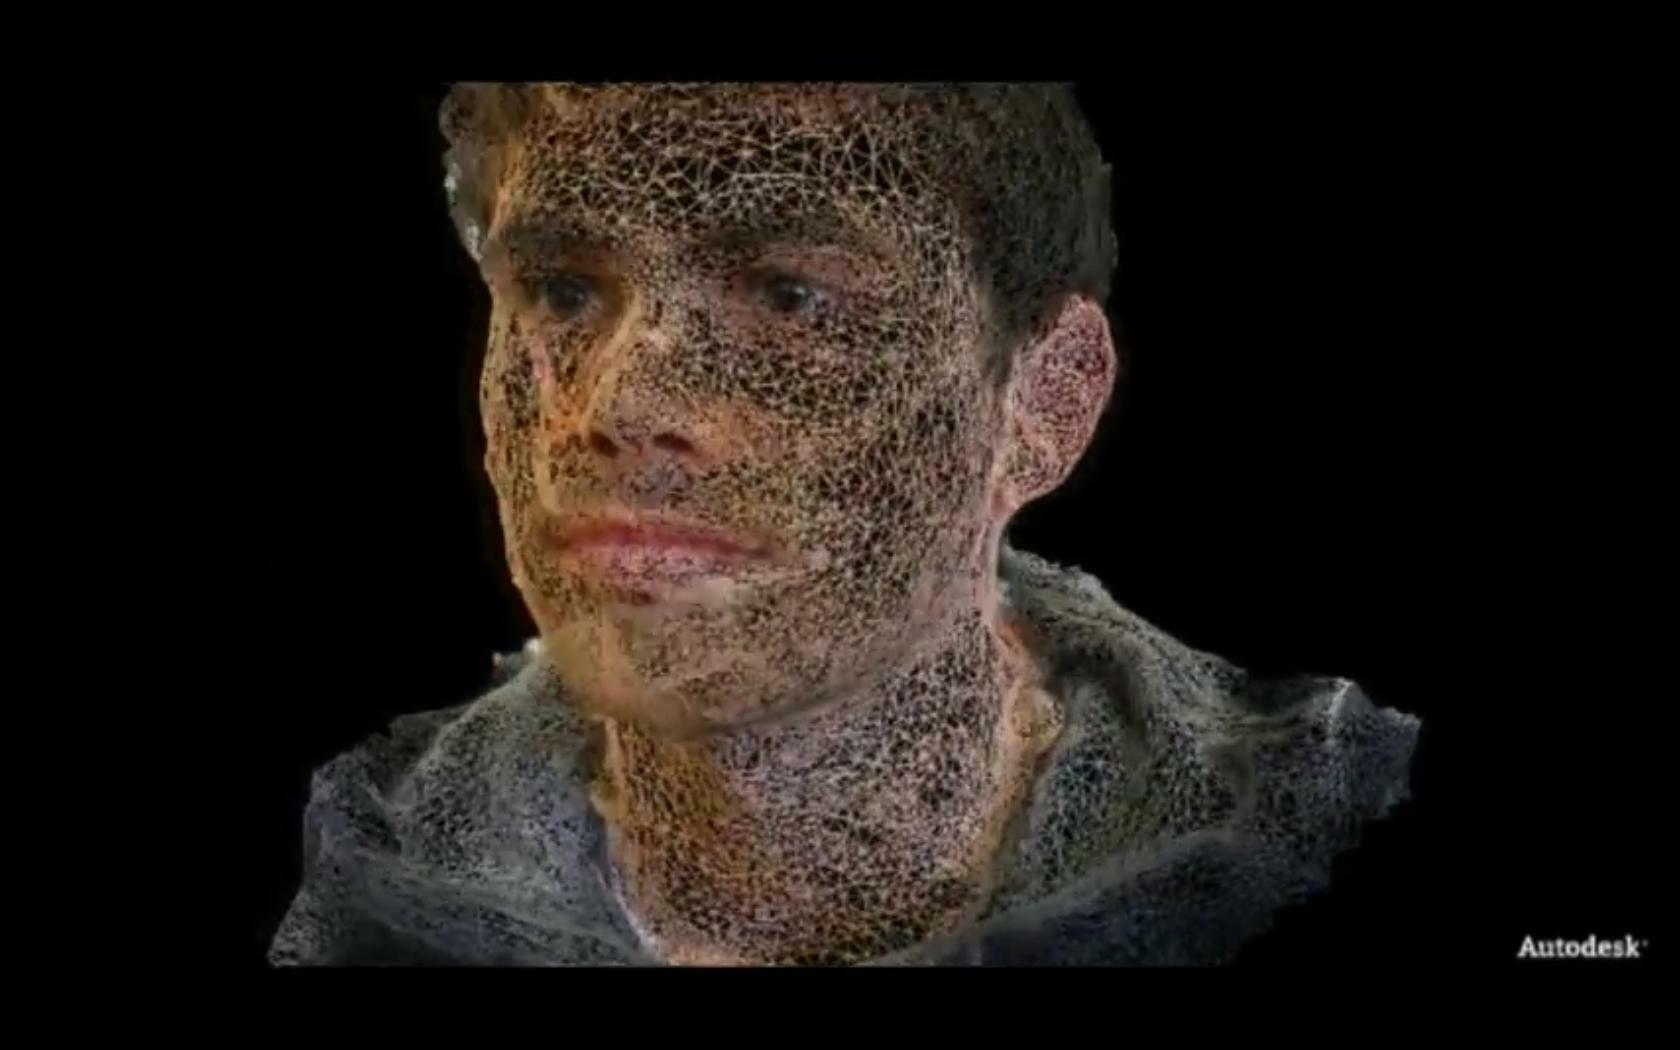 Photofly Can Turn Your 2D Digital Photos Into 3D Objects